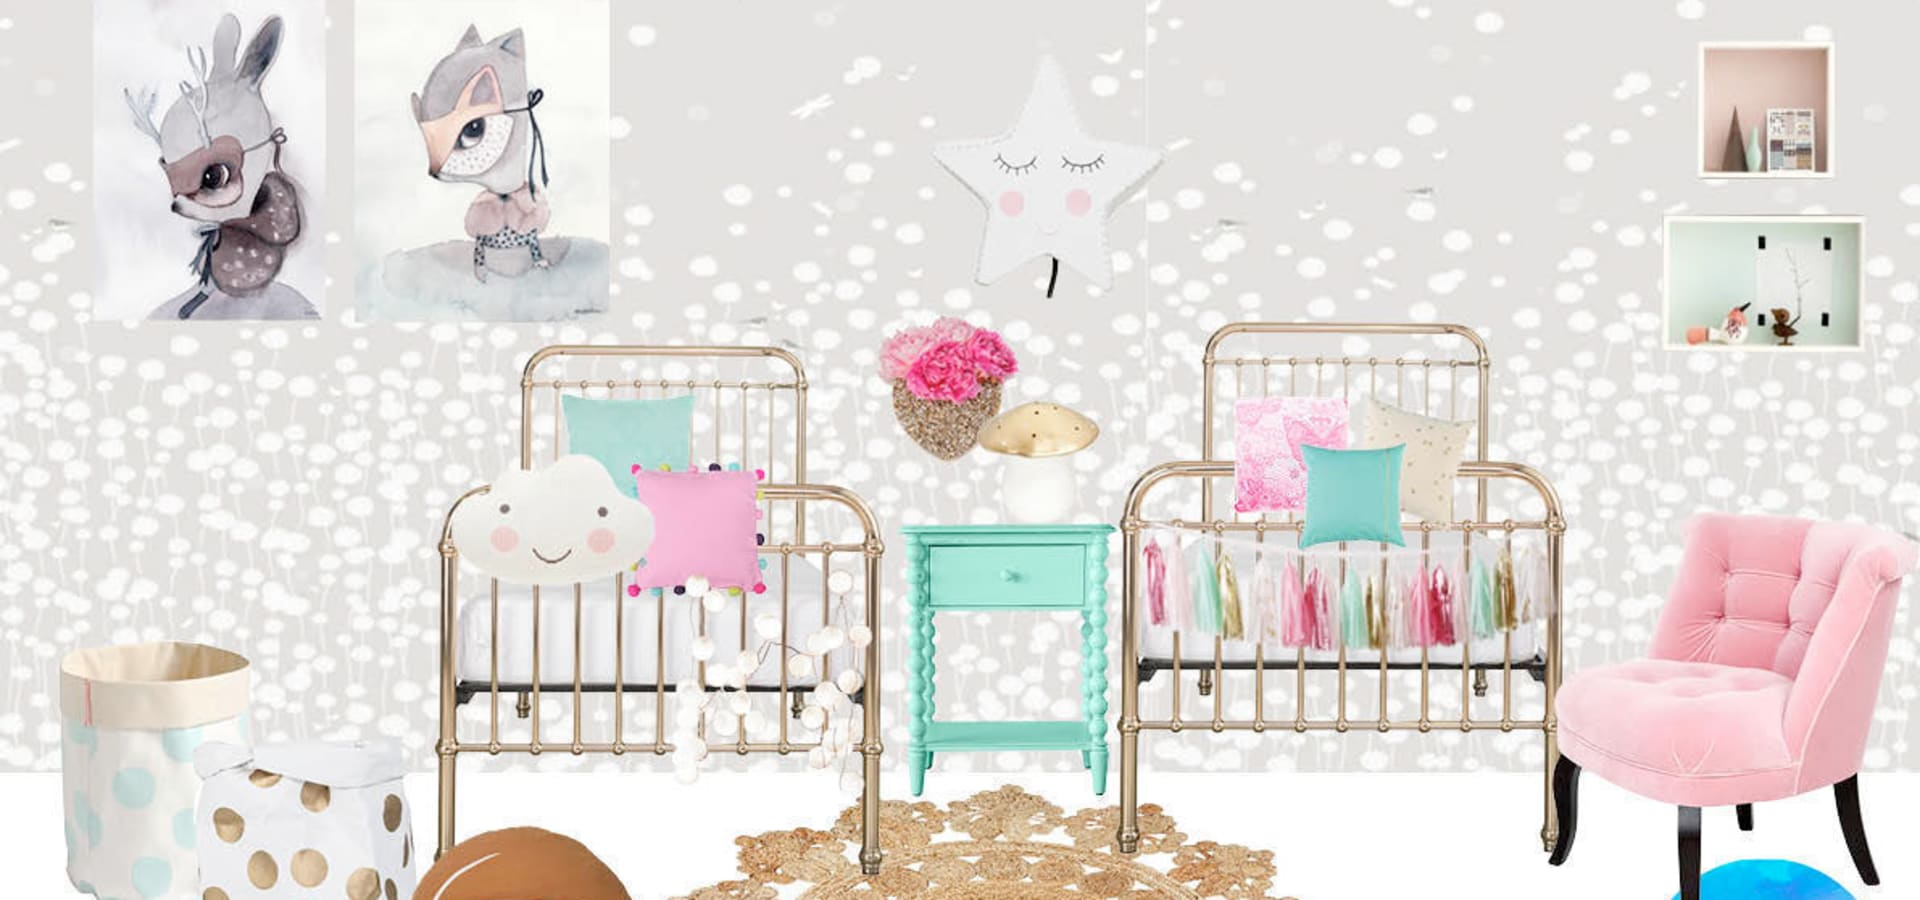 Mr Fox Nursery Von Kinderoo Childrens Interiors Homify